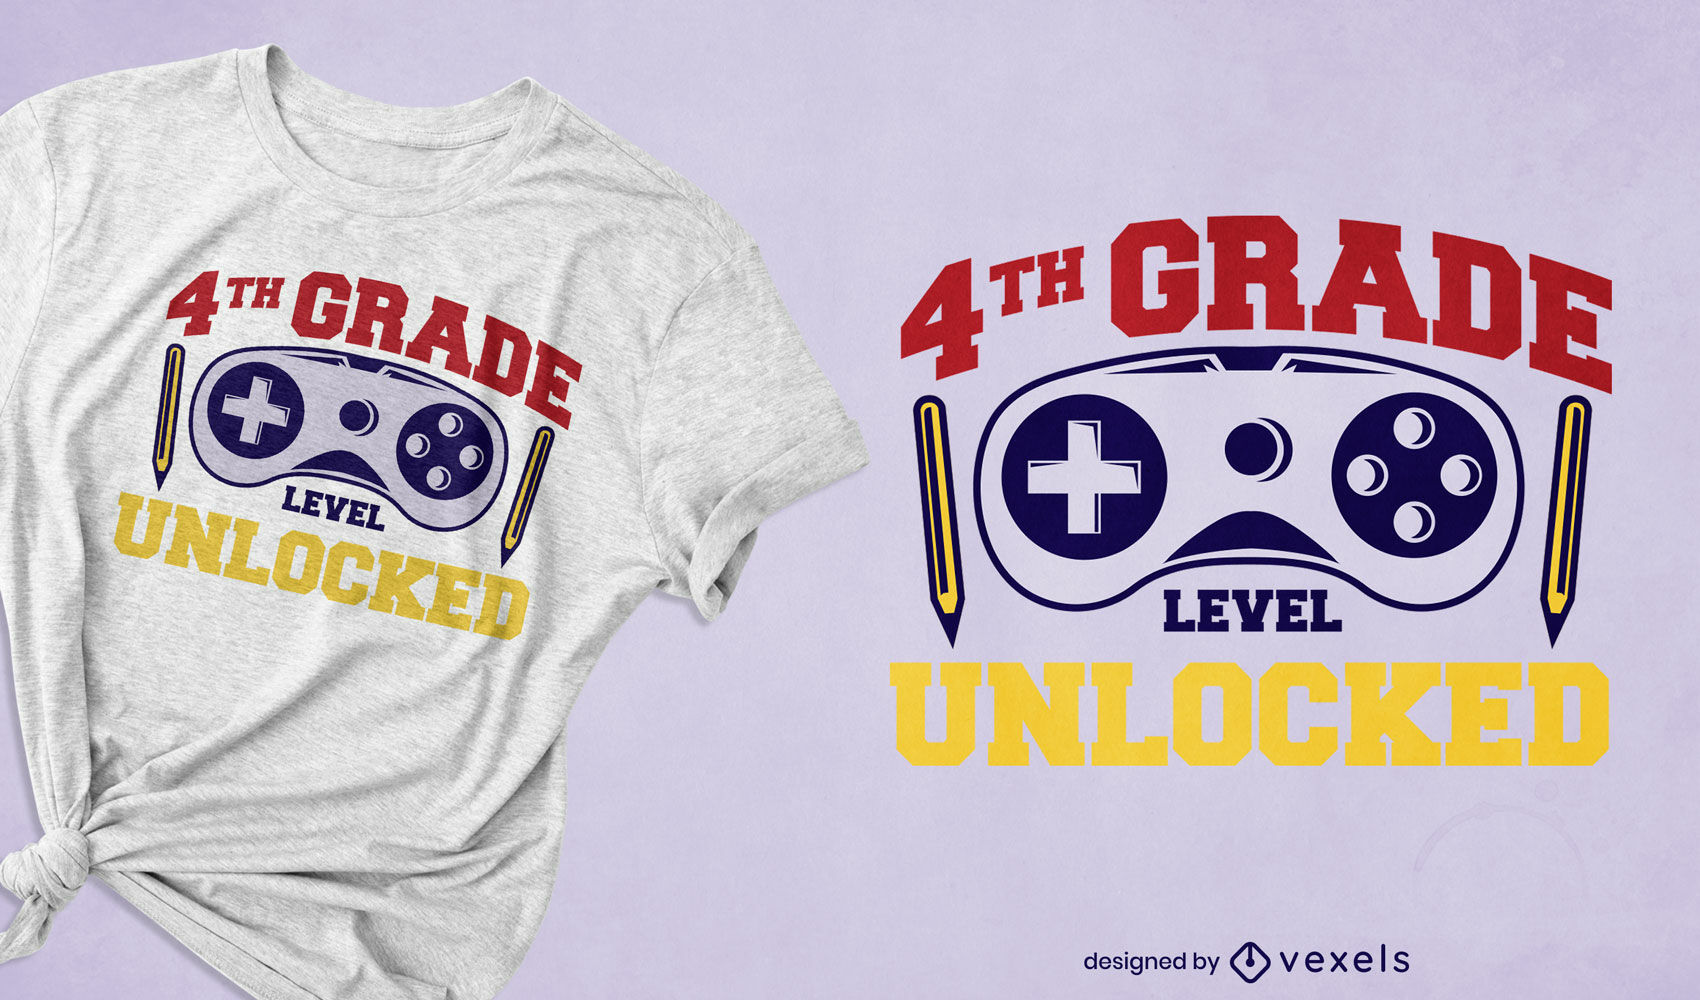 4th grade education t-shirt design